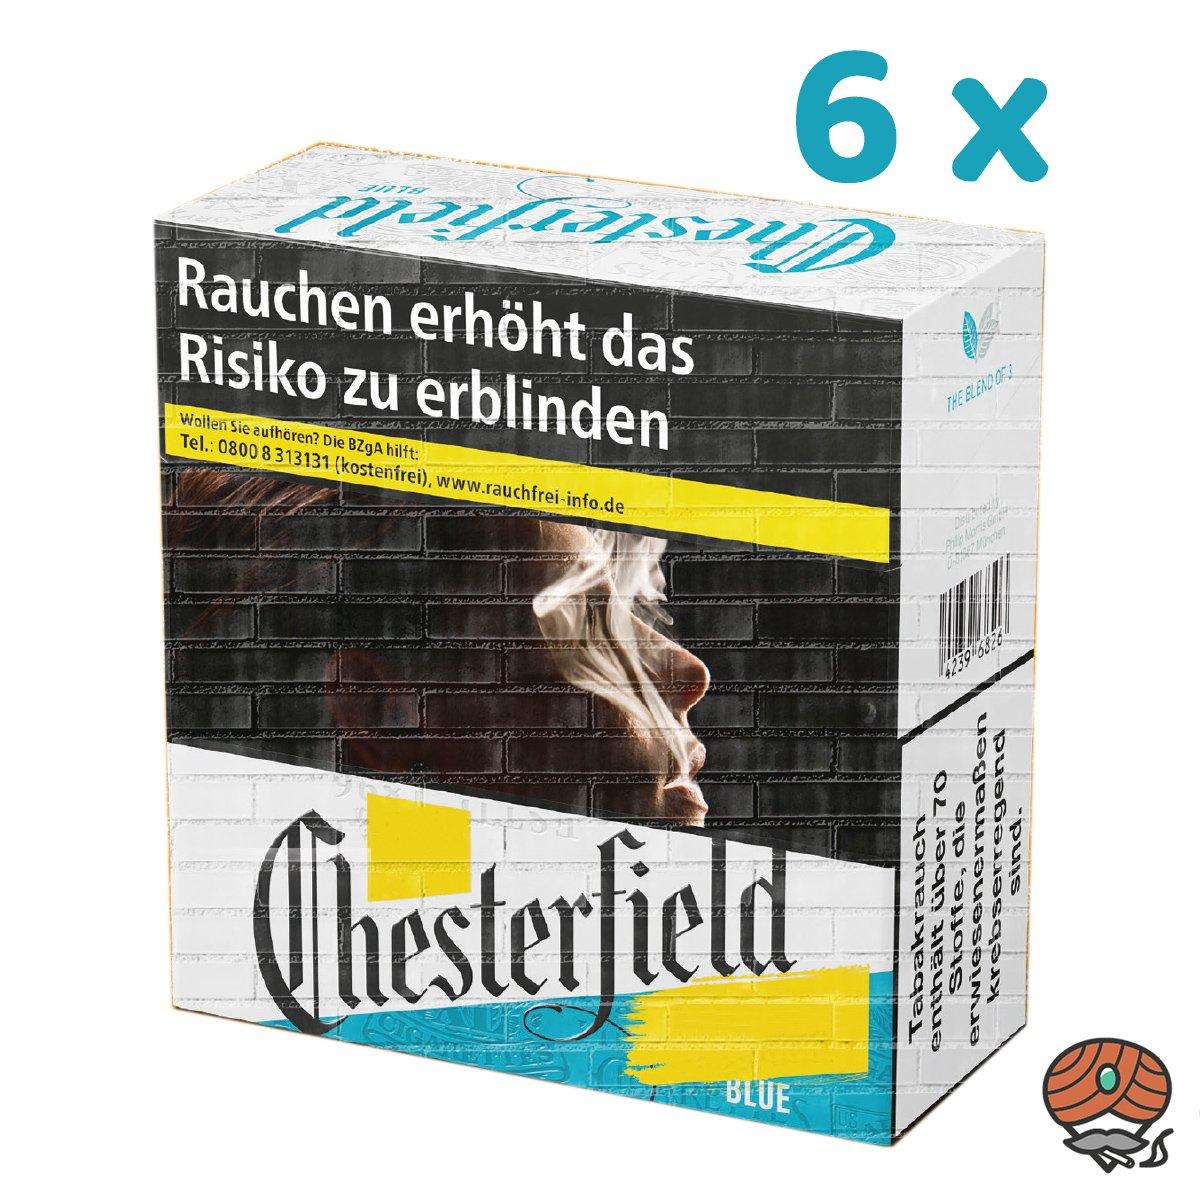 1 Stange Chesterfield BLUE / BLAU Zigaretten - 6 x 47 Stück